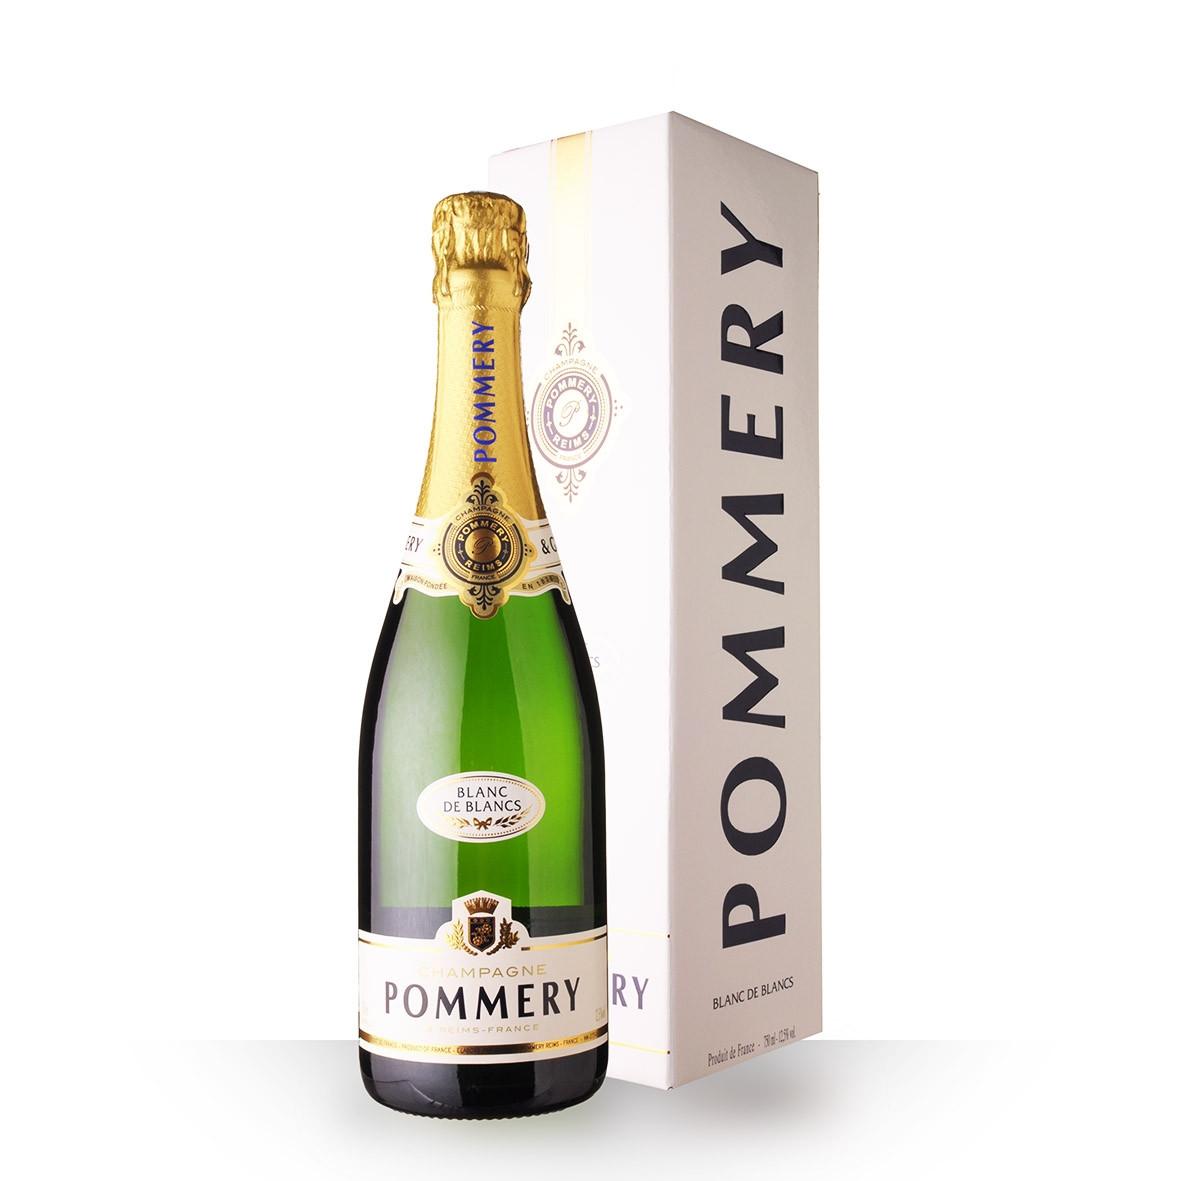 Champagne Pommery Apanage Blanc de Blanc 75cl Etui www.odyssee-vins.com